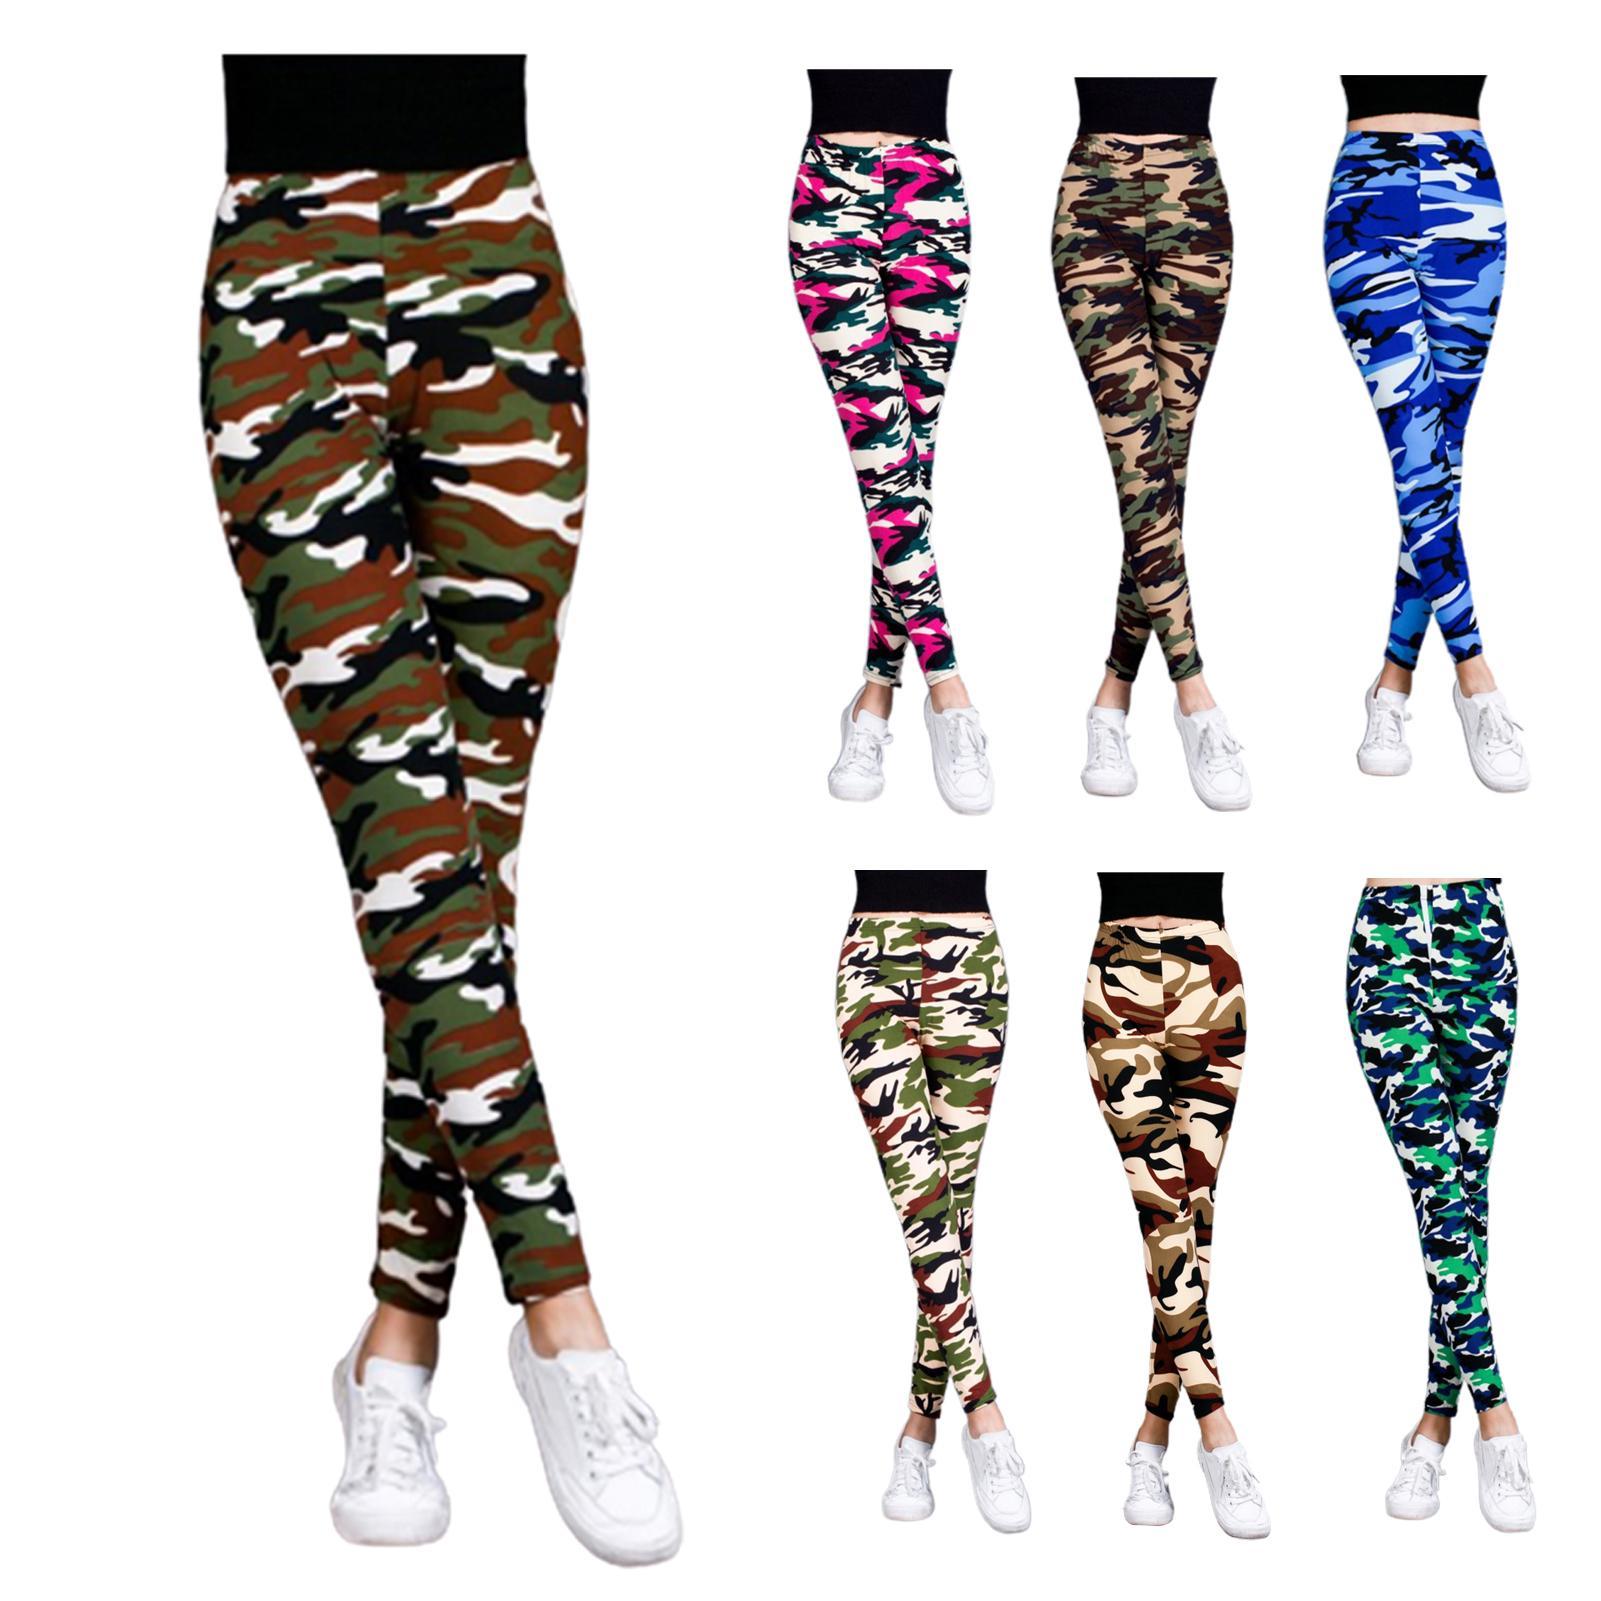 Women Camouflage Printed Large Size High Waist Elastic Slim Ninth Pants Legging Trendy camouflage plus size stretch crochet new